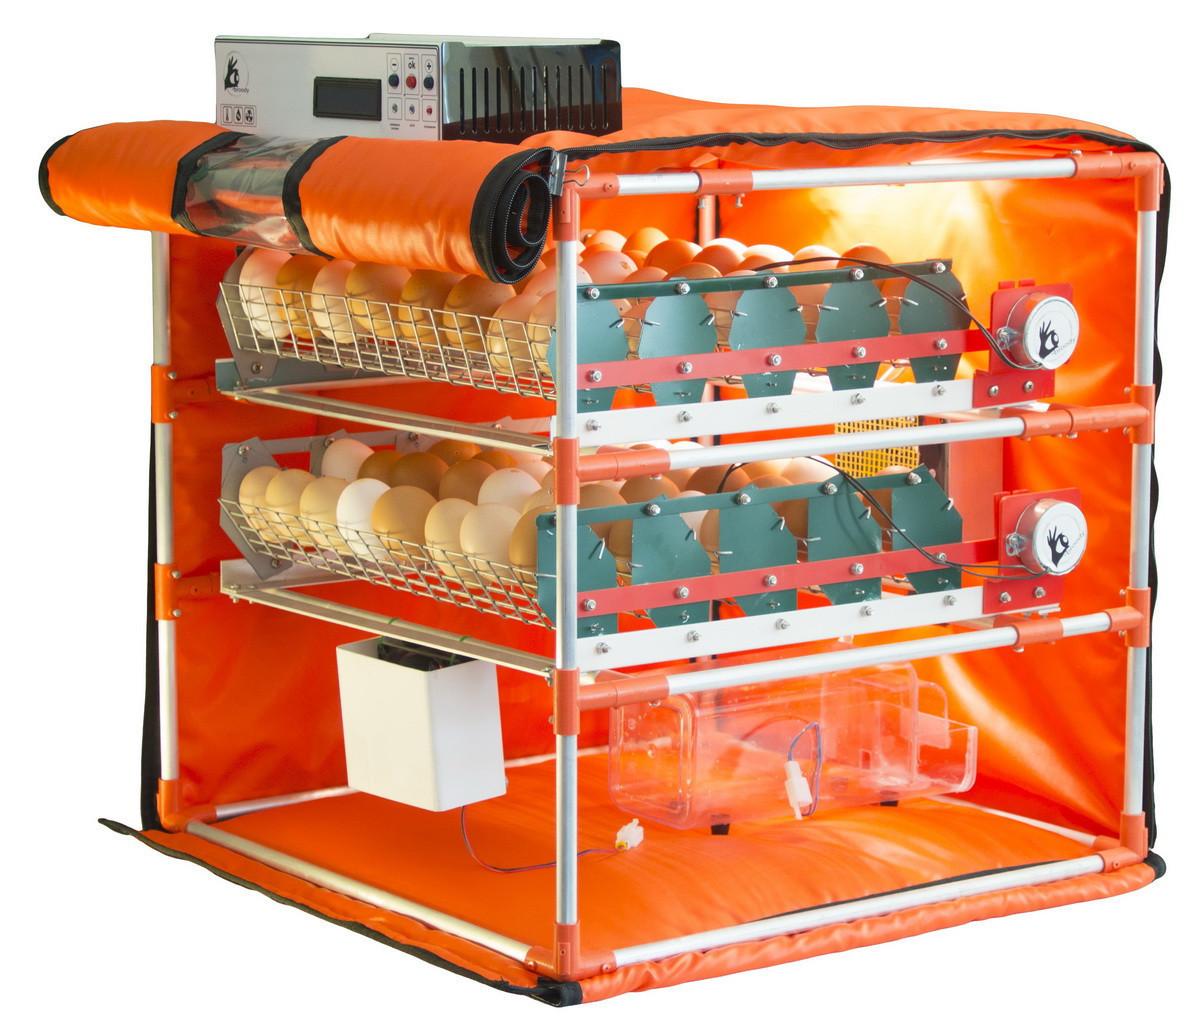 Автоматический инкубатор-конструктор (220V) на 56 яиц водоплавающих птиц, с увлажнителем, WI-FI